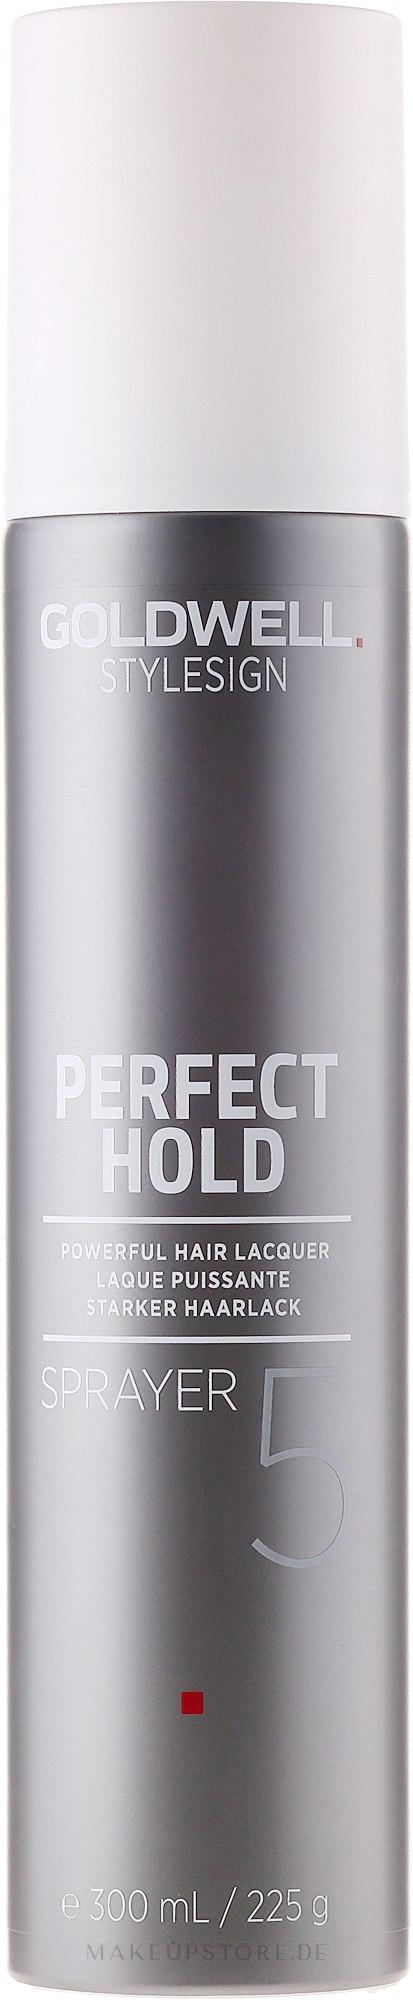 Haarlack Starker Halt - Goldwell Stylesign Perfect Hold Sprayer Powerful Hair Lacquer — Bild 300 ml